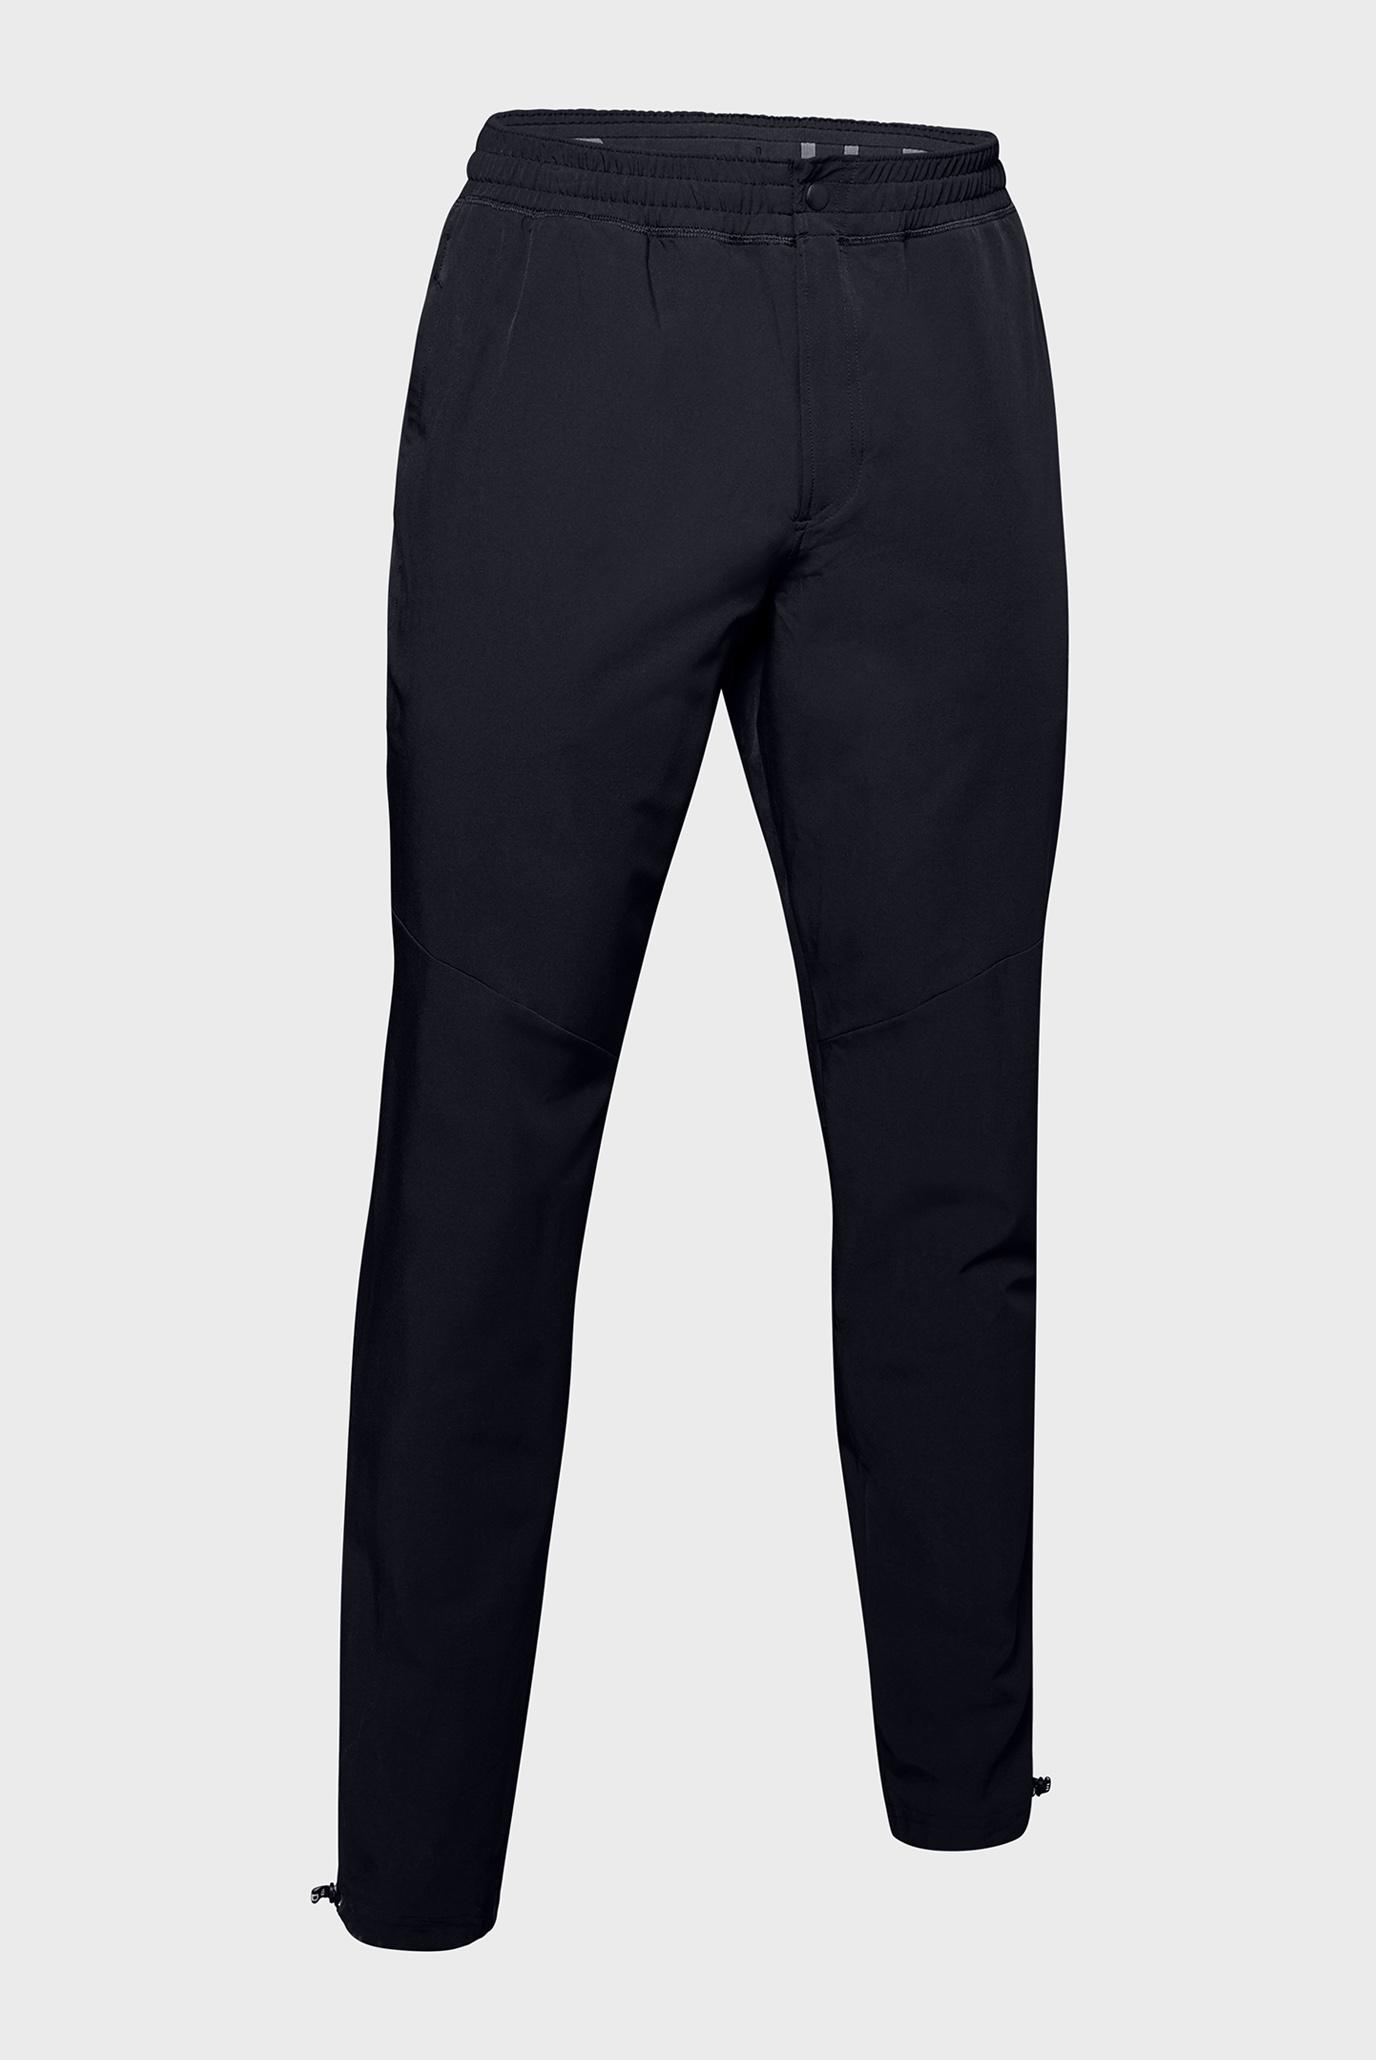 Мужские черные брюки UNSTOPPABLE WOVEN PANT Under Armour